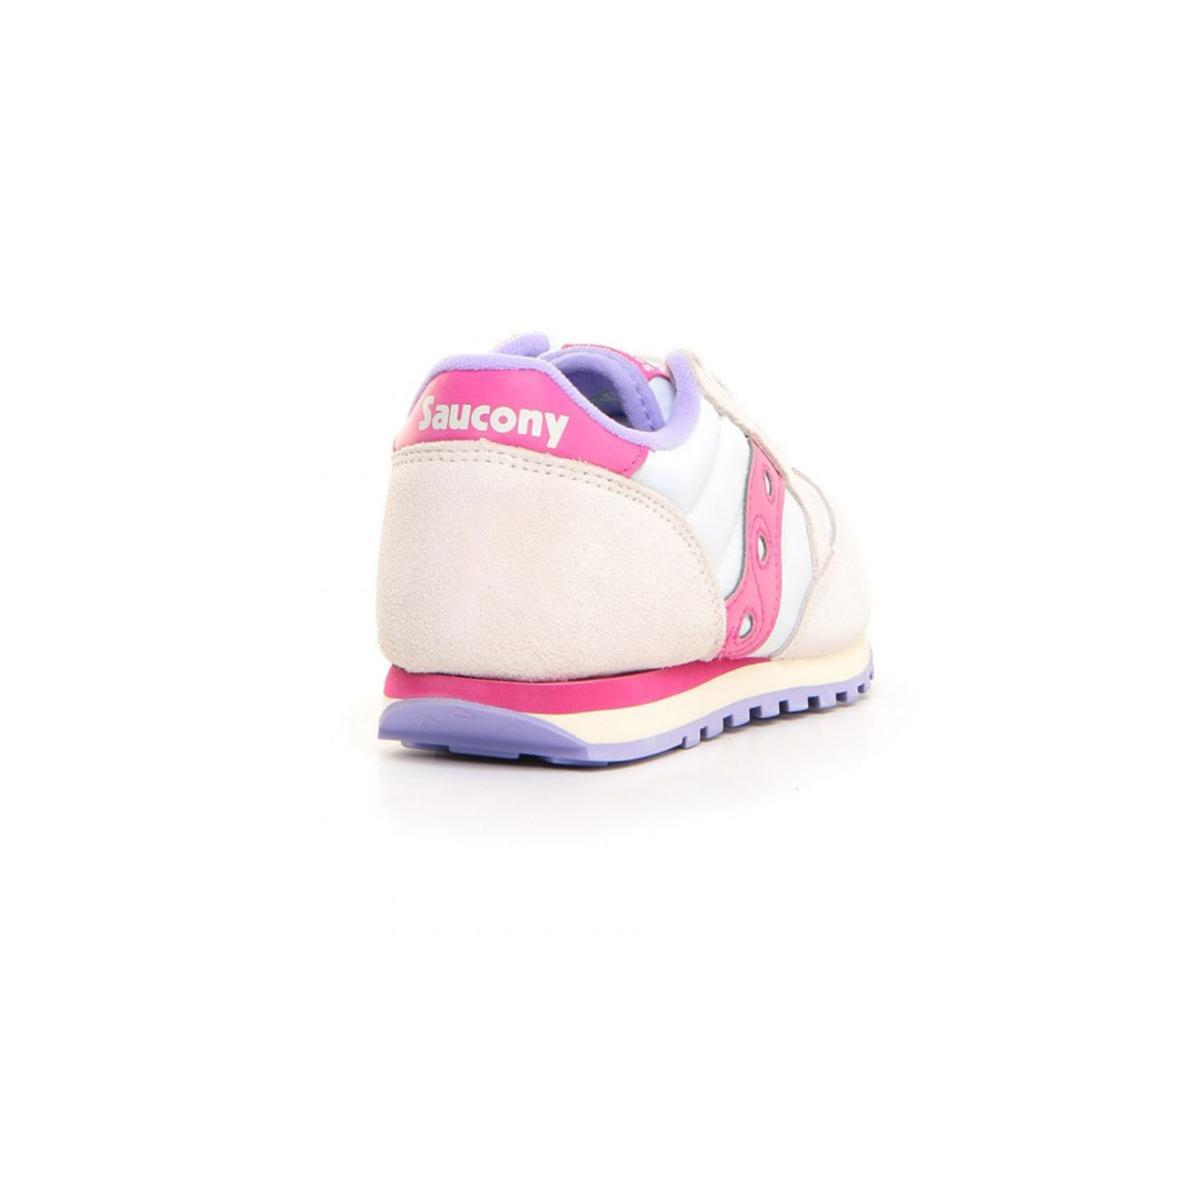 Scarpe Sneakers Saucony Jazz Original White/Berry da bambina rif. SK162931